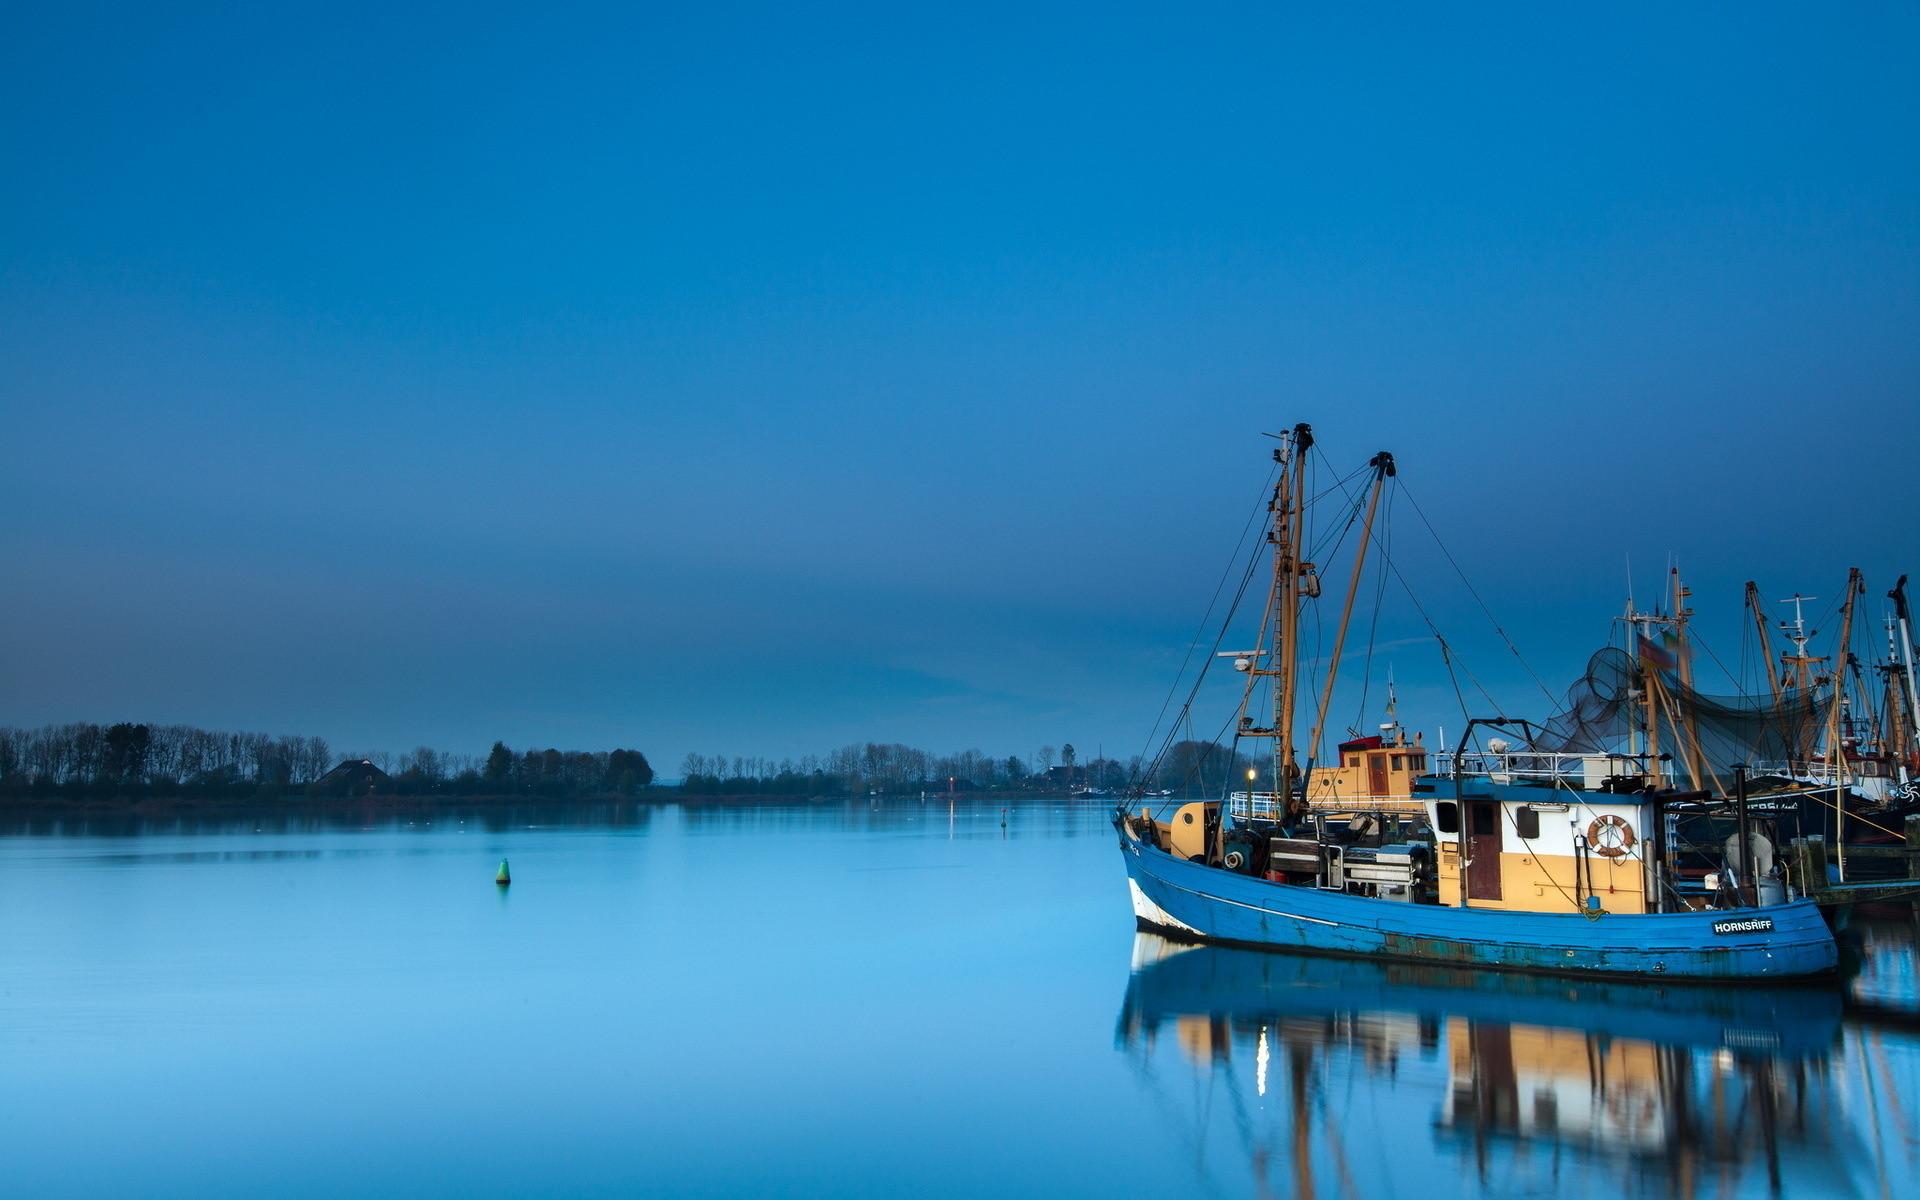 bass fishing boat wallpaper » Wallppapers Gallery